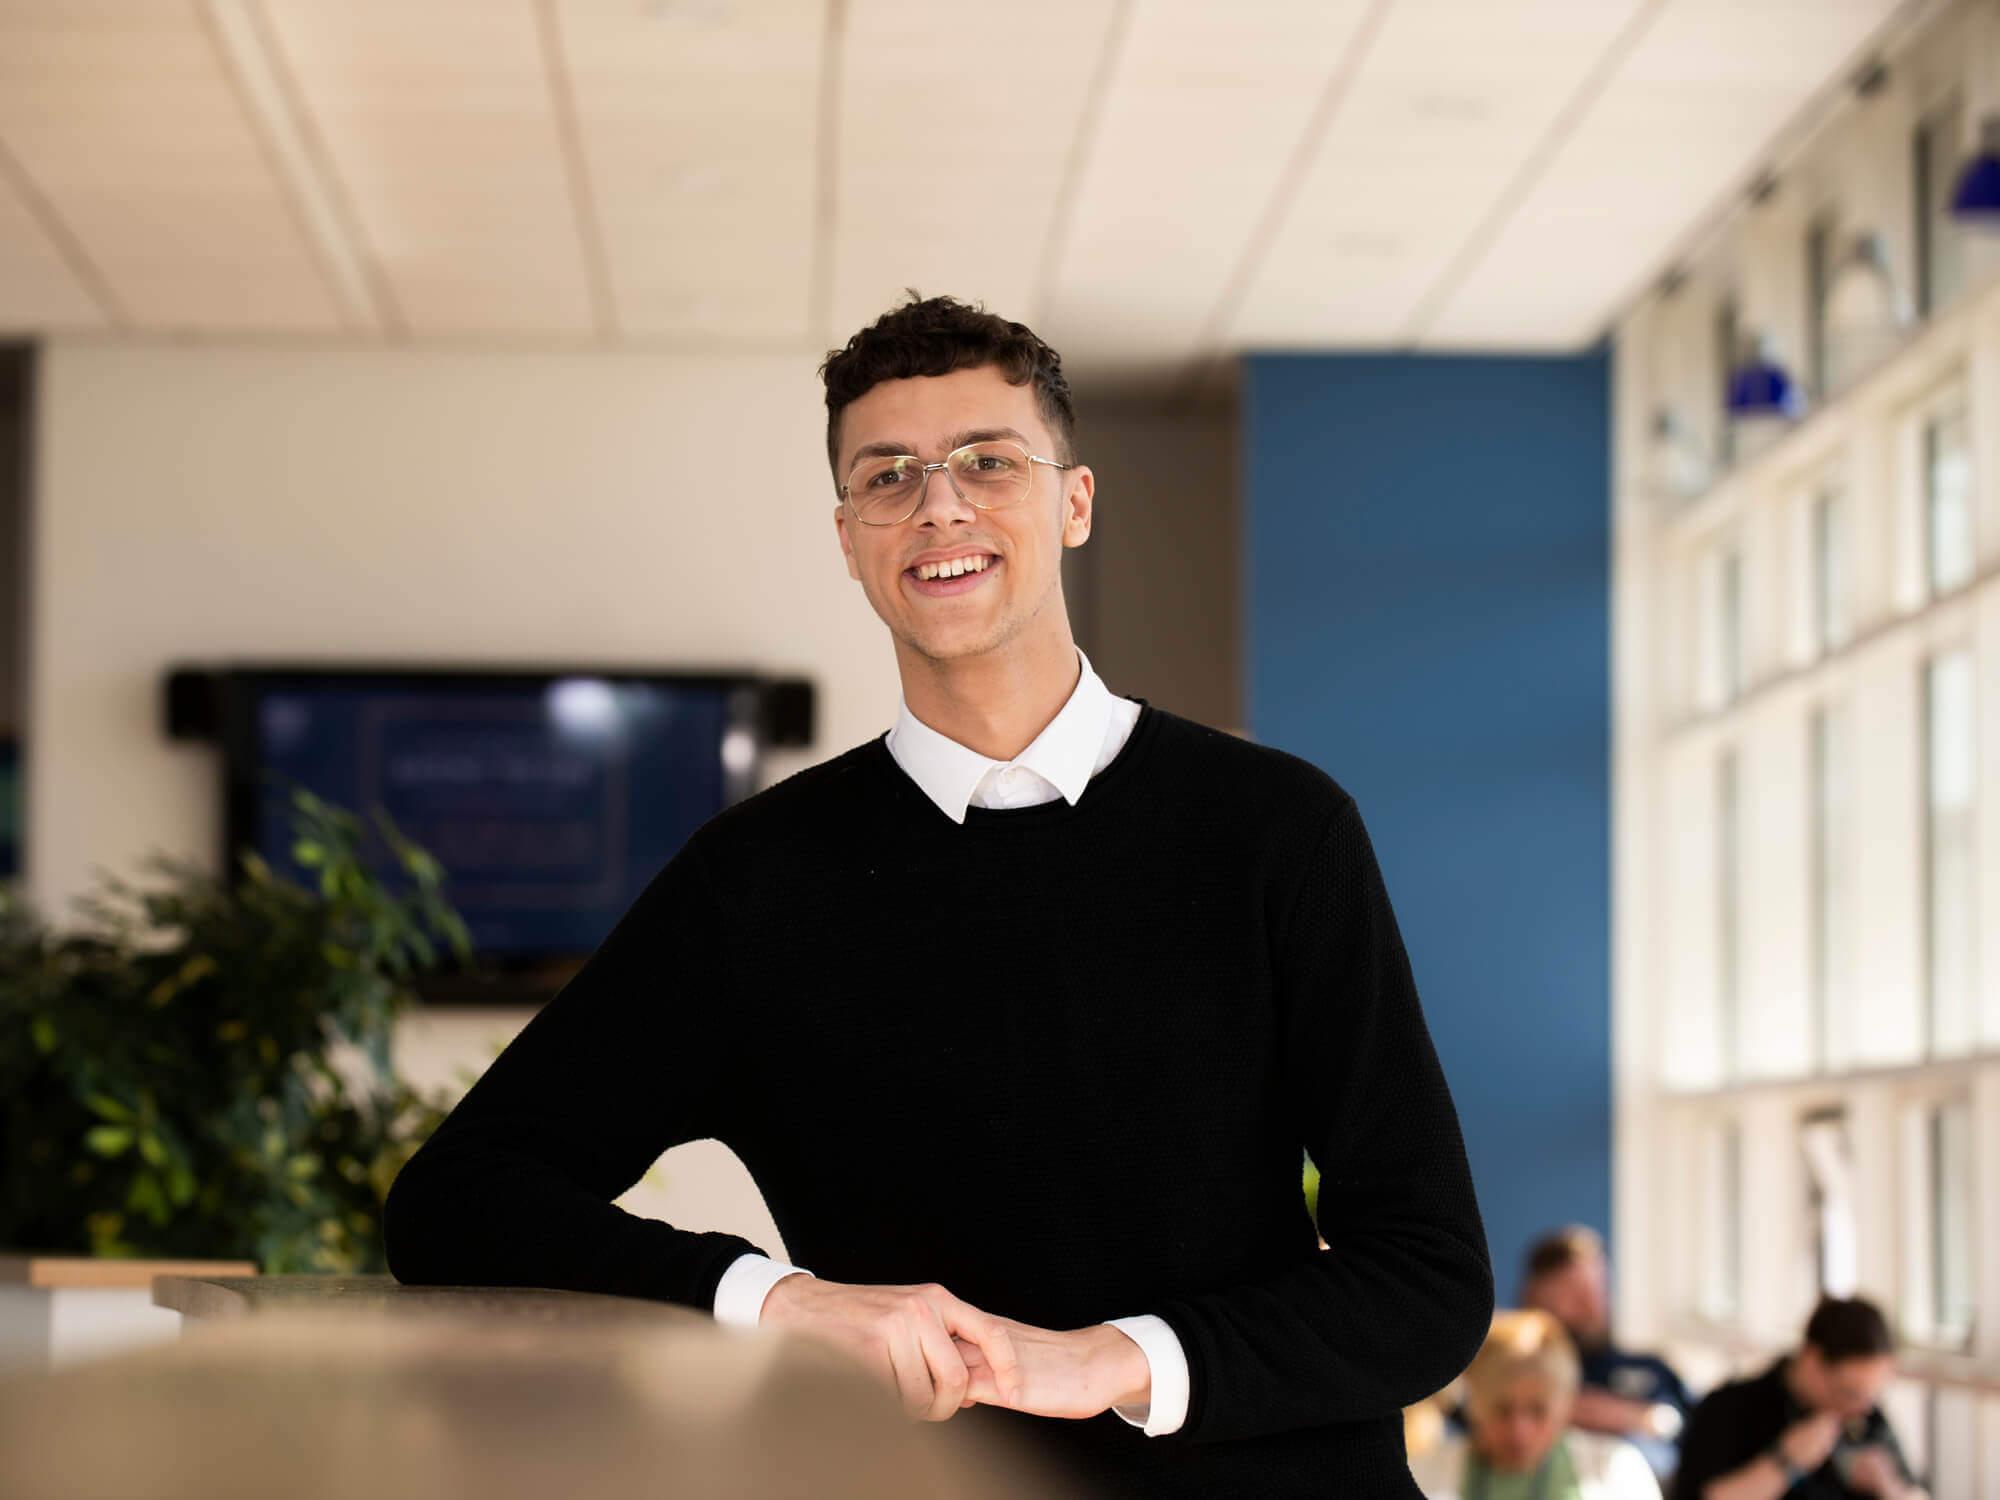 Image of student Jonathan Storer